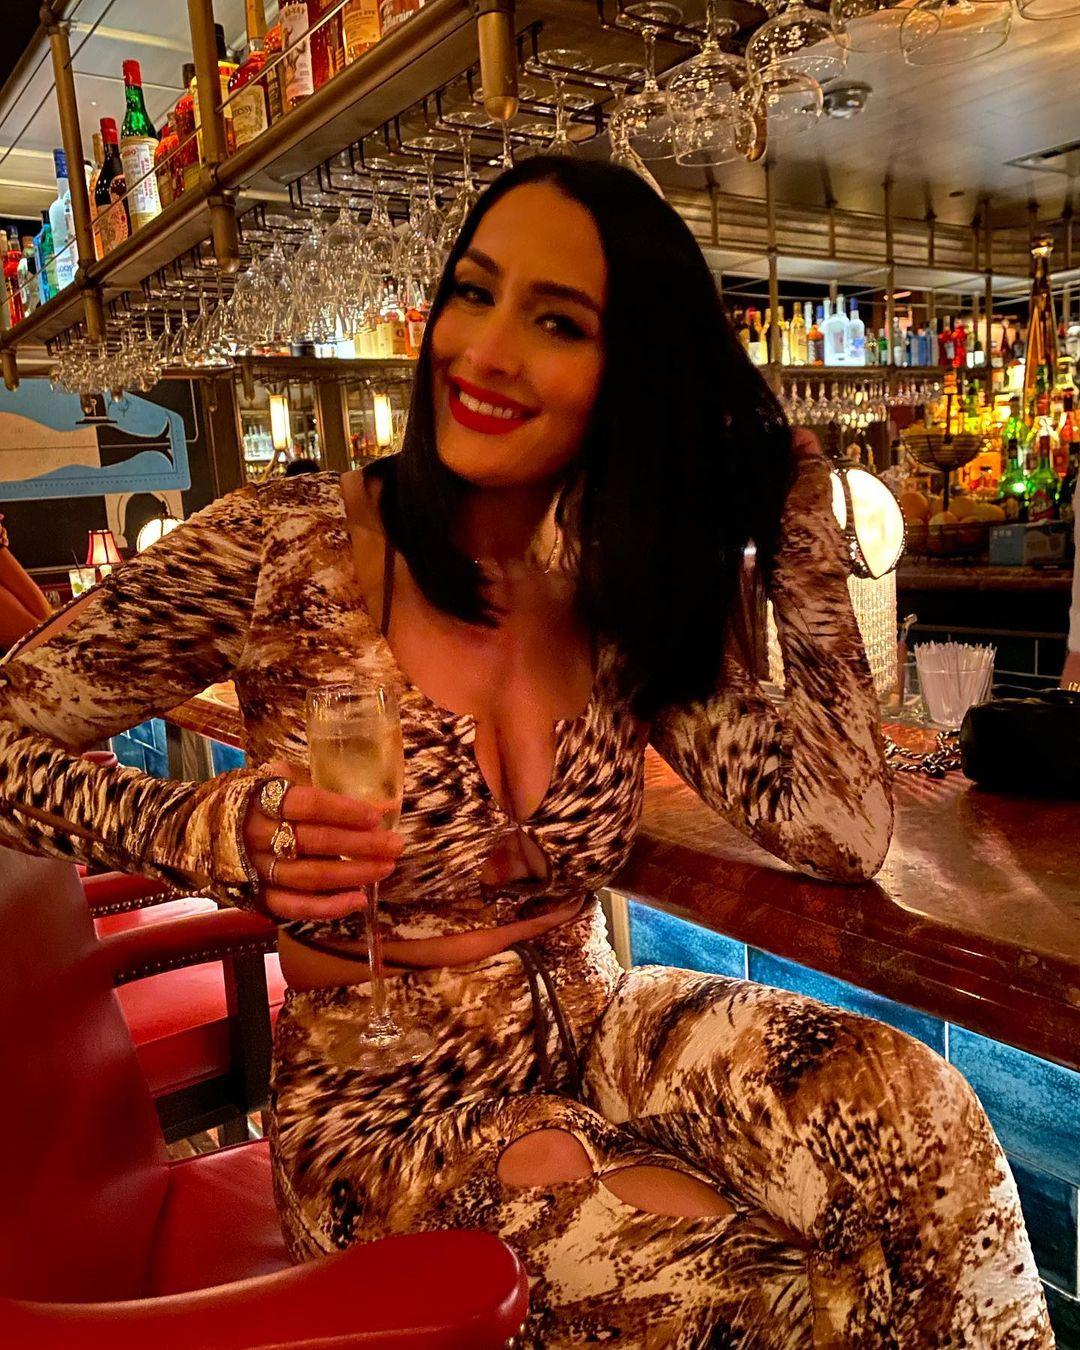 Photos: Nikki Bella Spends Time At Bar After WWE Summerslam 2021 Ban 136